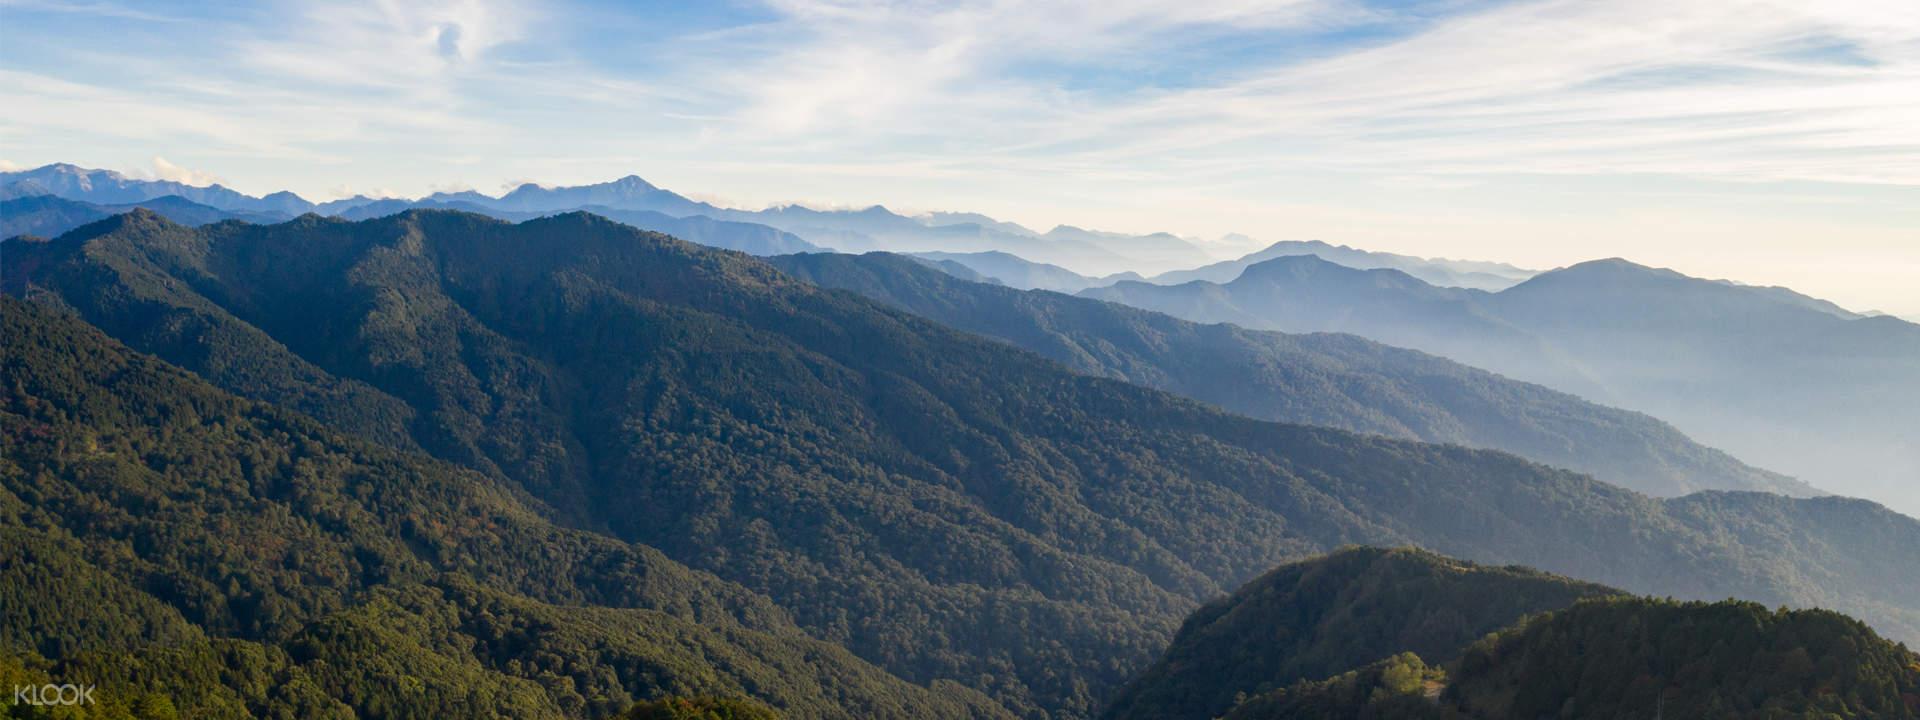 Discover Alishan Mountain - Klook